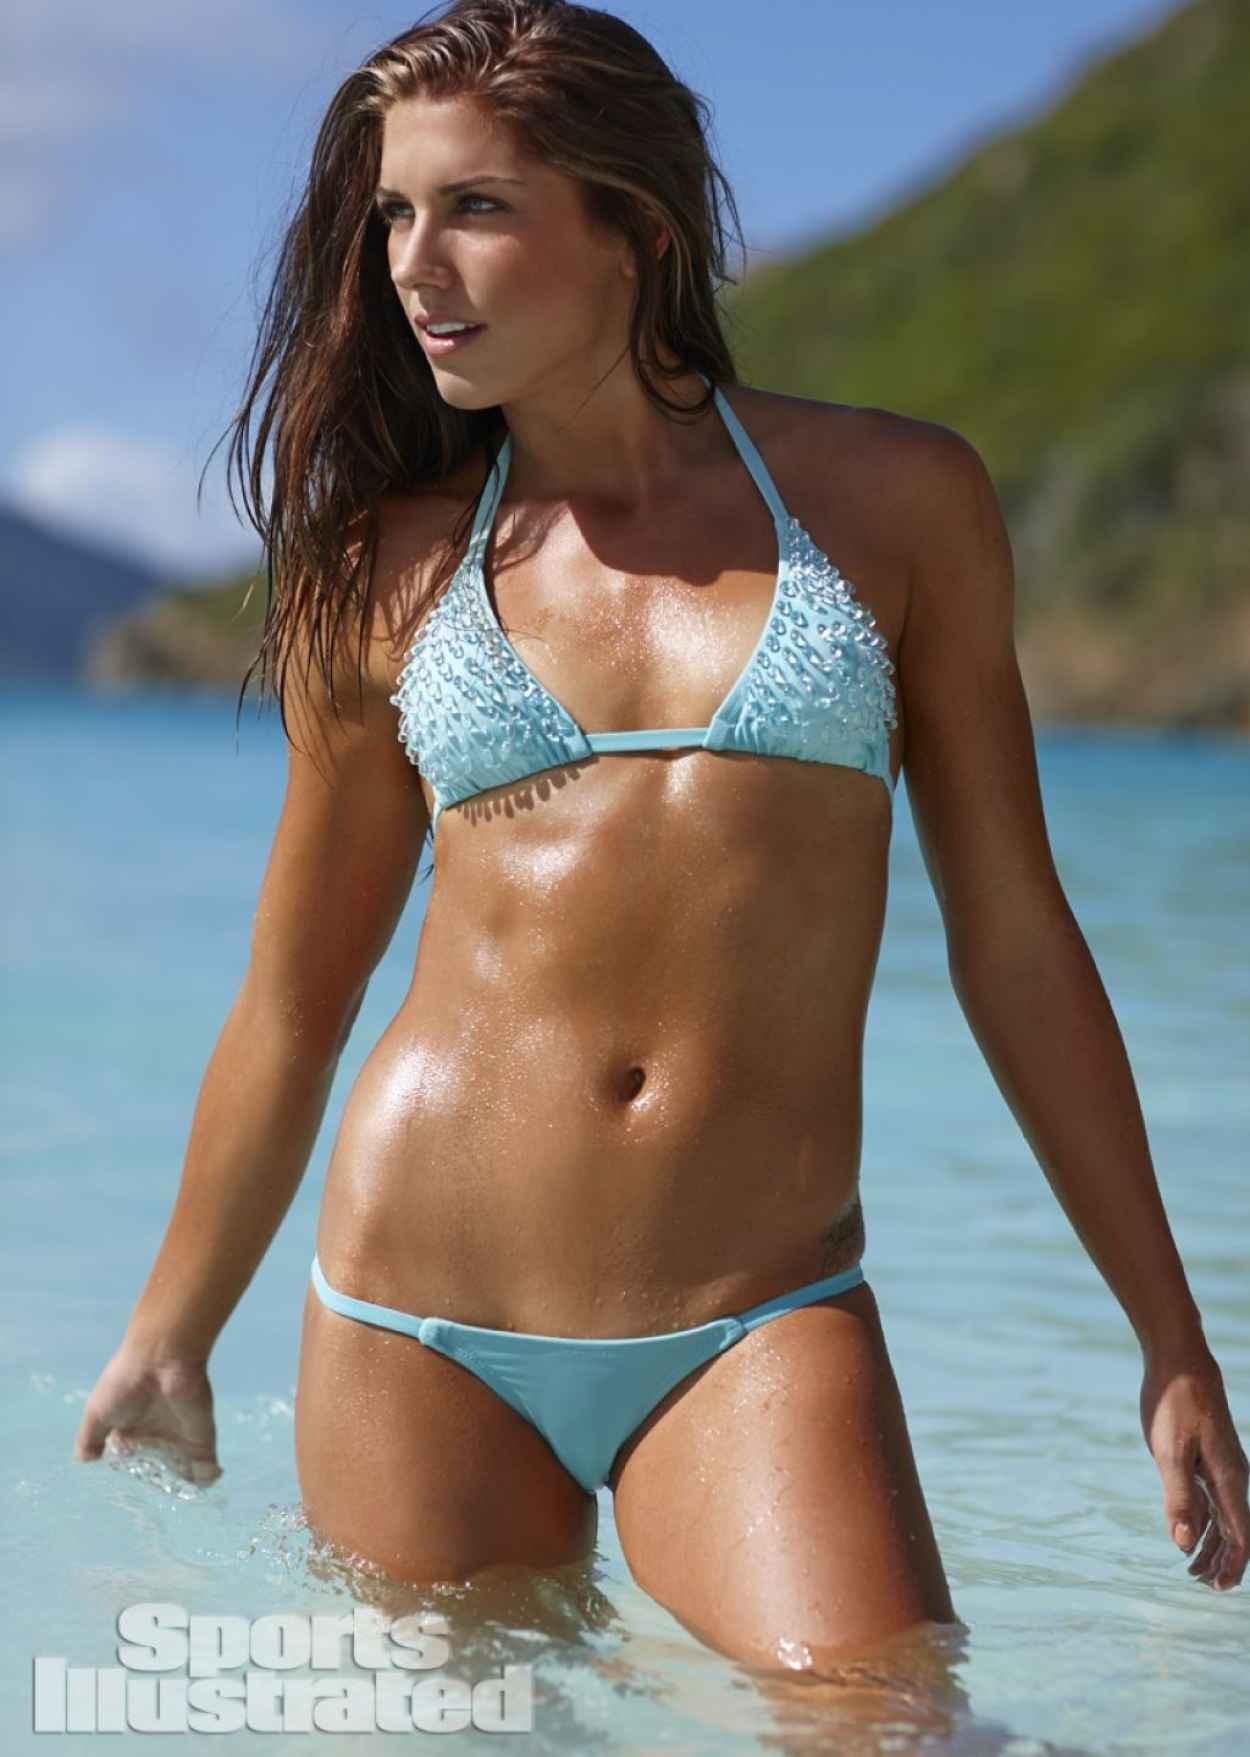 Share Sports illustrated bikini videos think